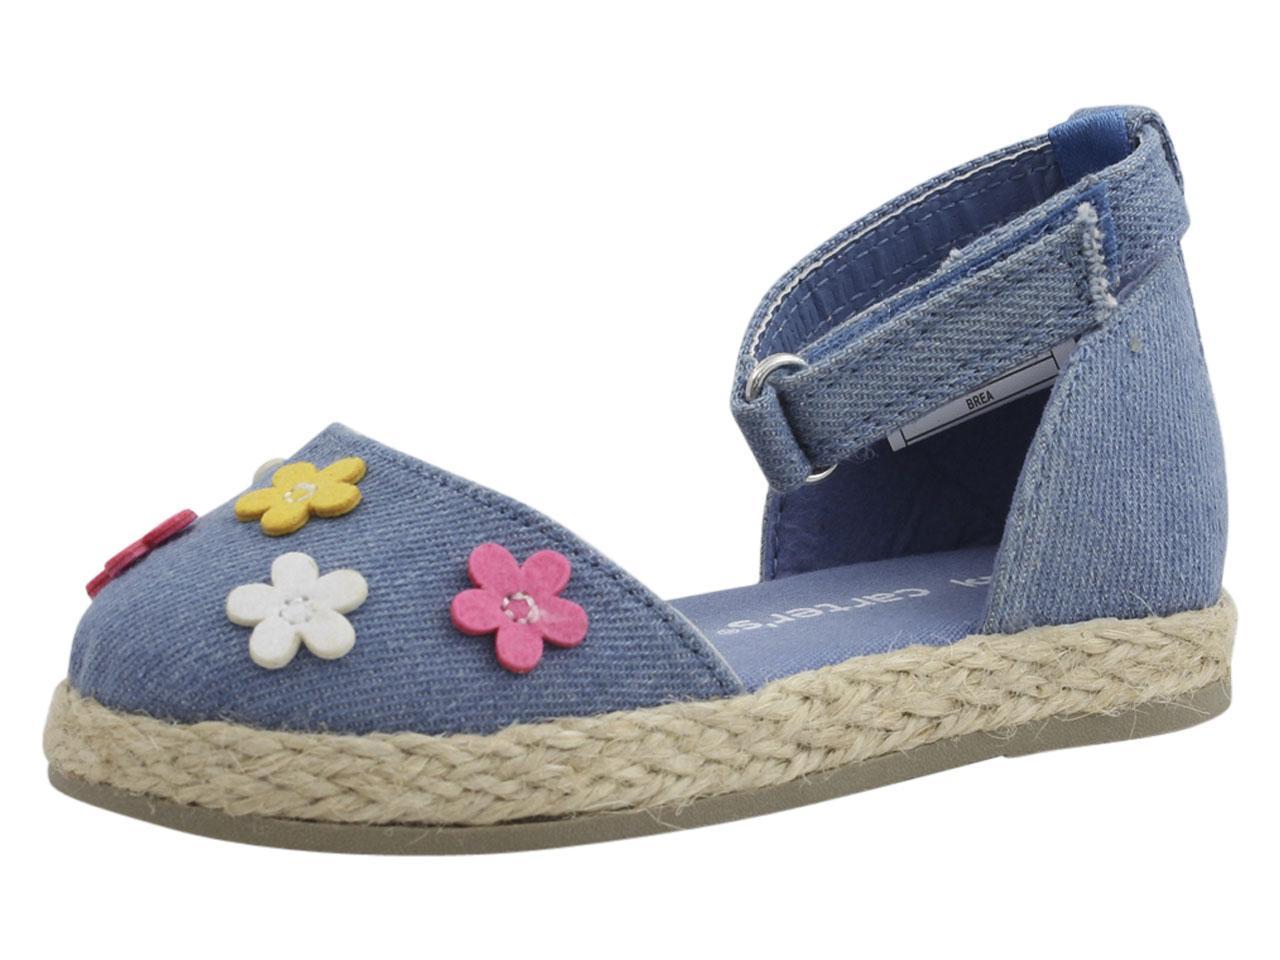 8cfb4b690380 Carter s Toddler Little Girl s Brea Espadrilles Sandals Shoes